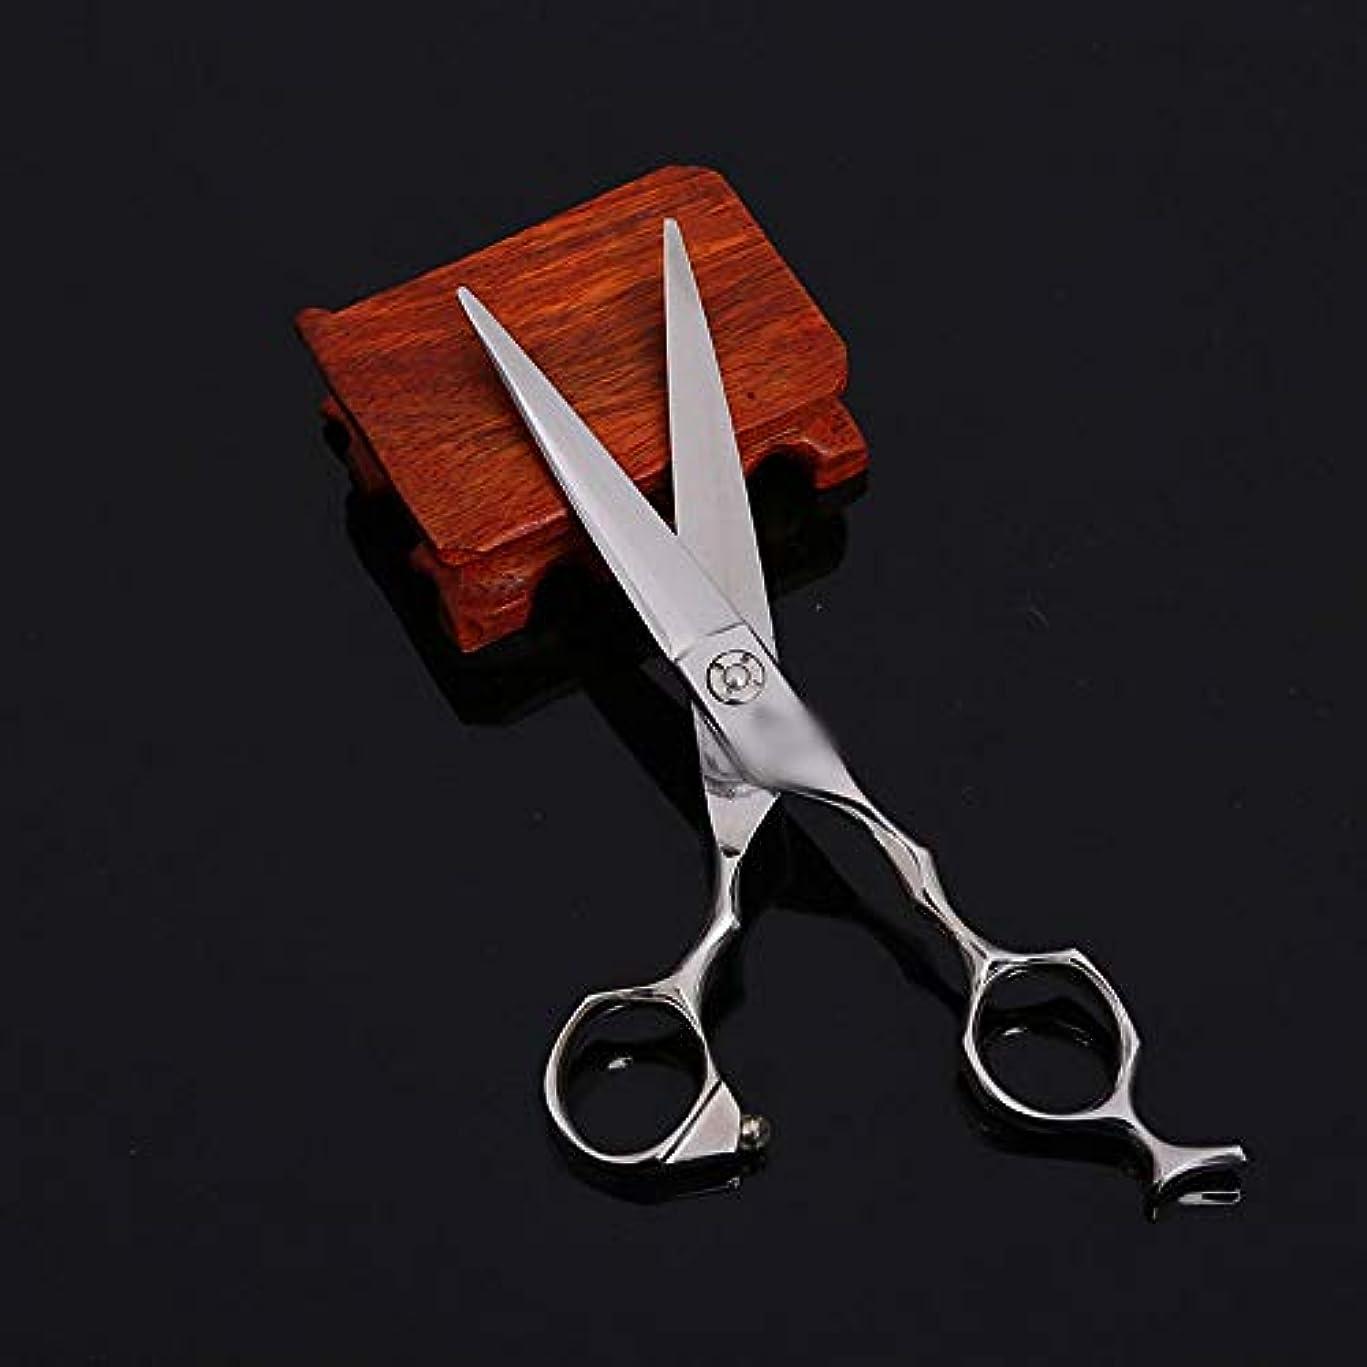 TAKAYAMA 6インチの理髪師特別なハイエンドのプロの理髪ツールフラットはさみ (色 : Silver)